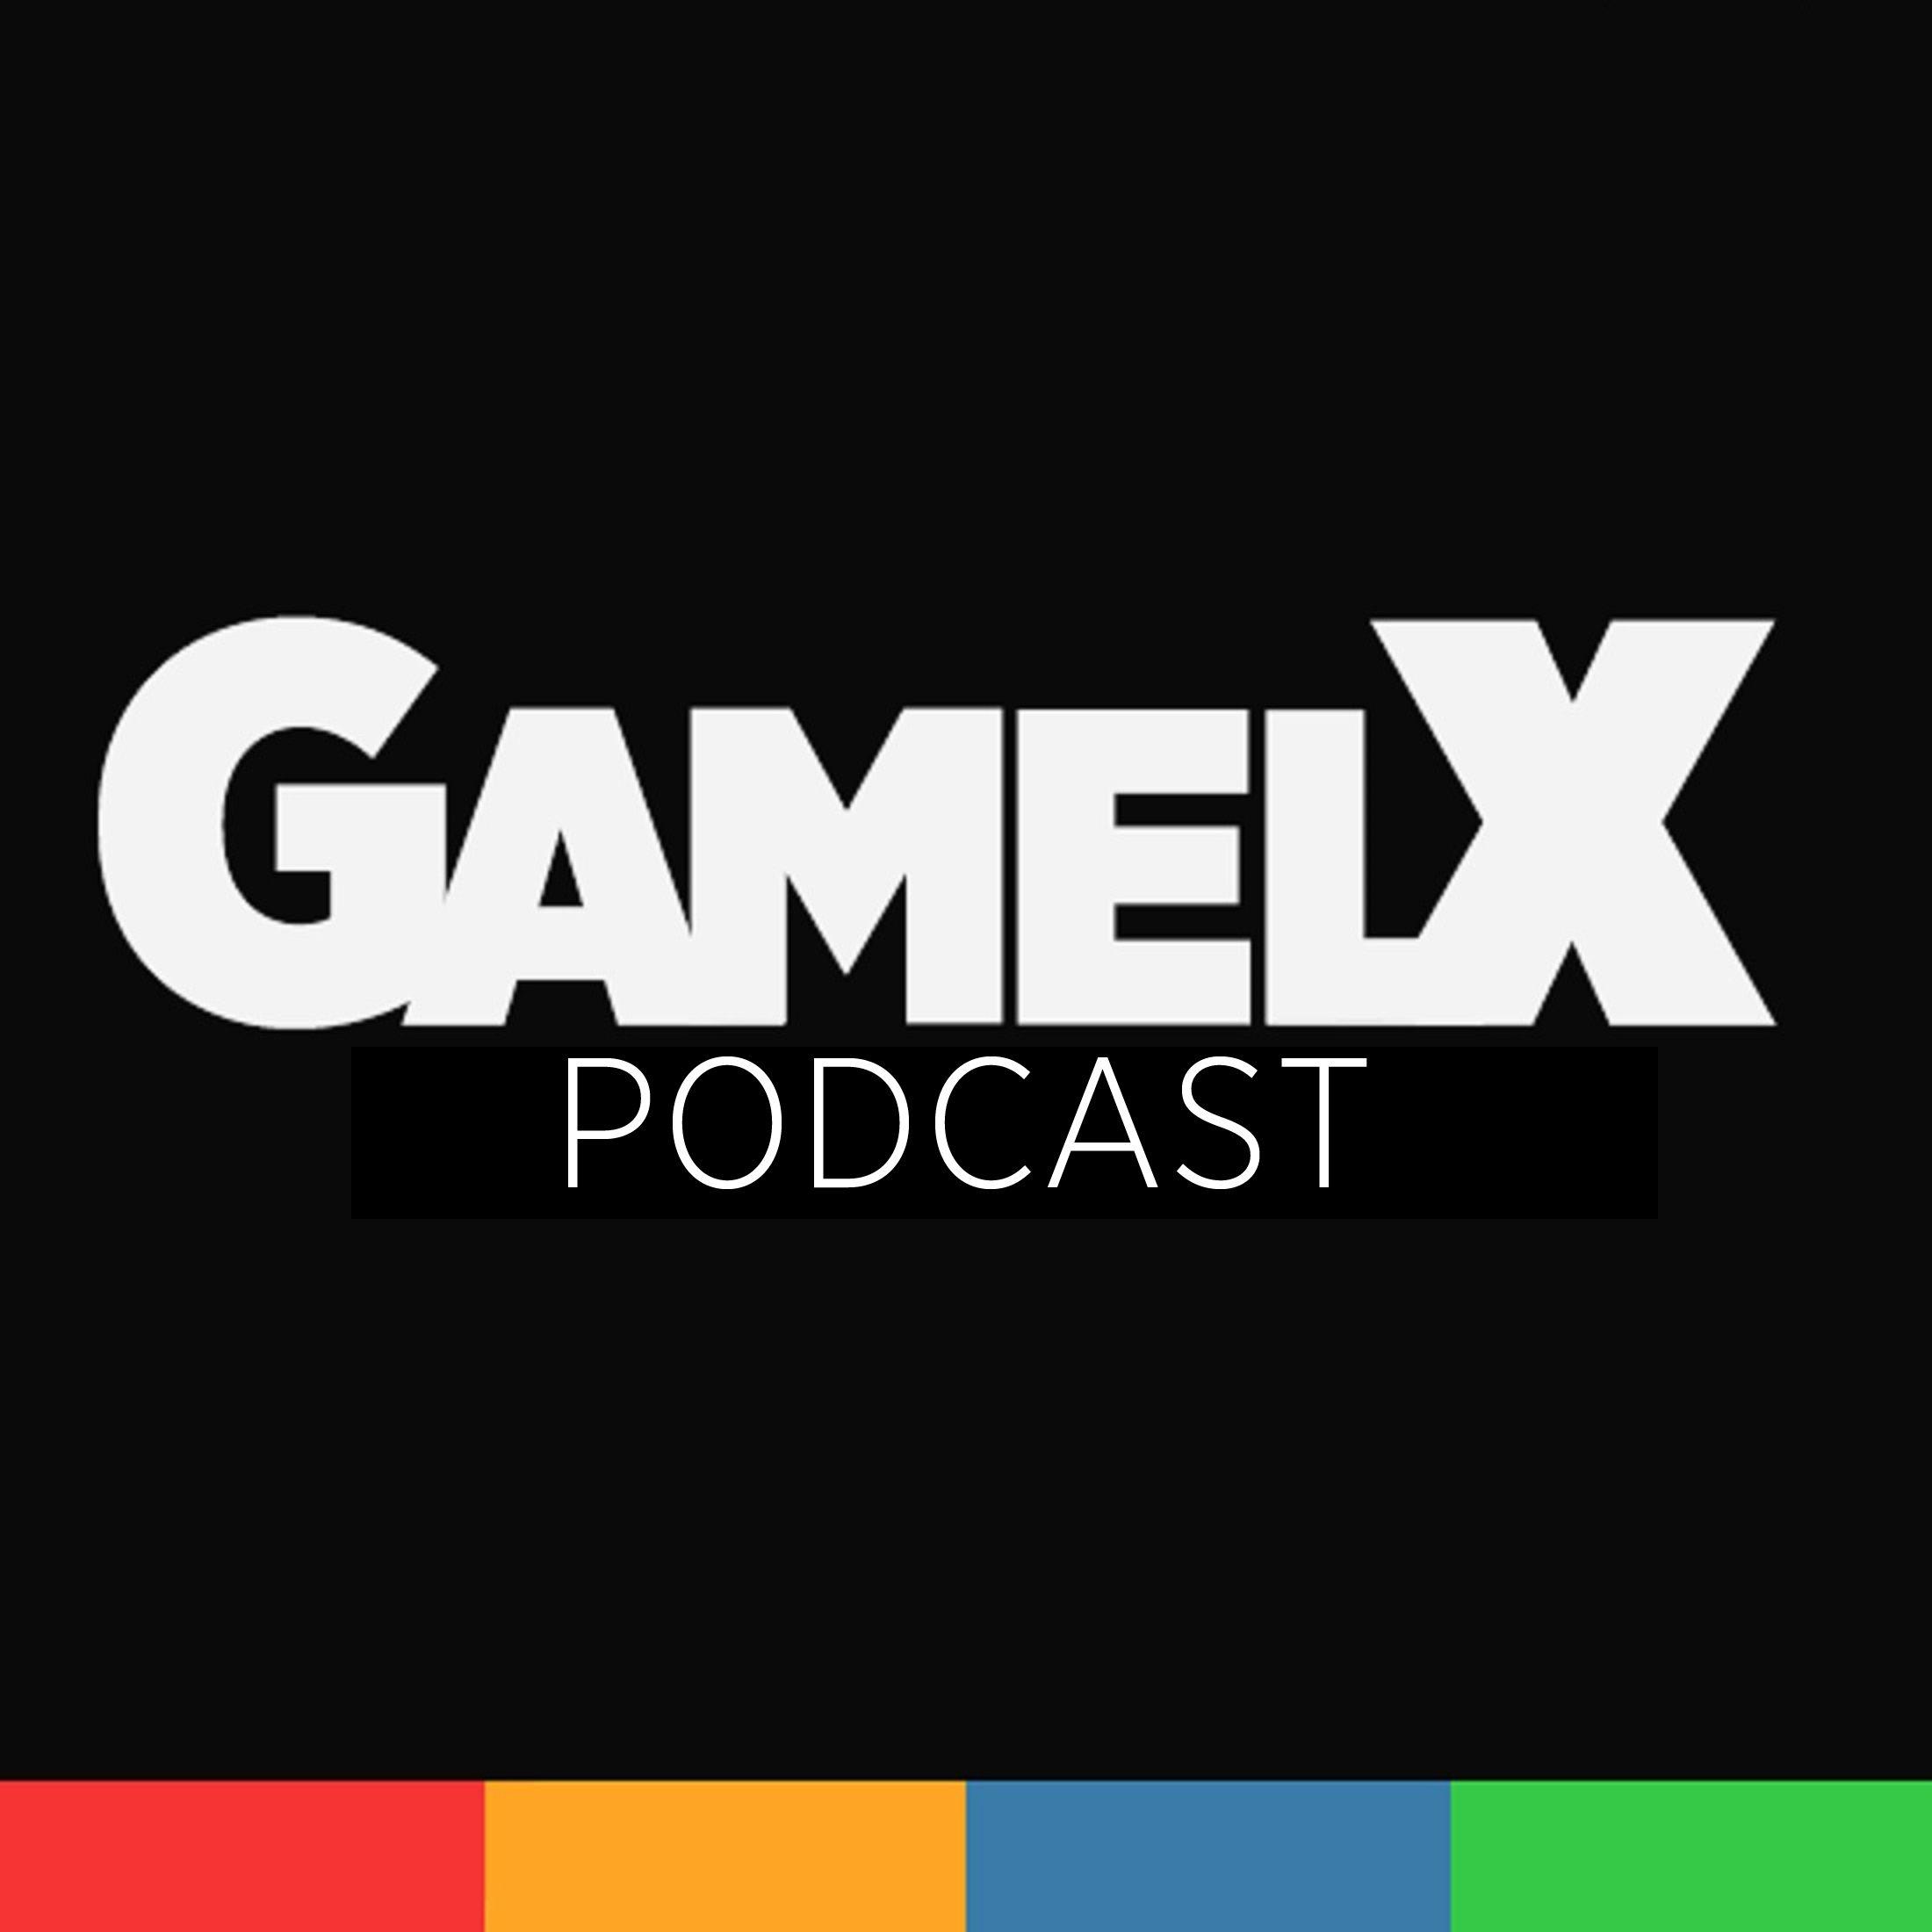 GAMELX